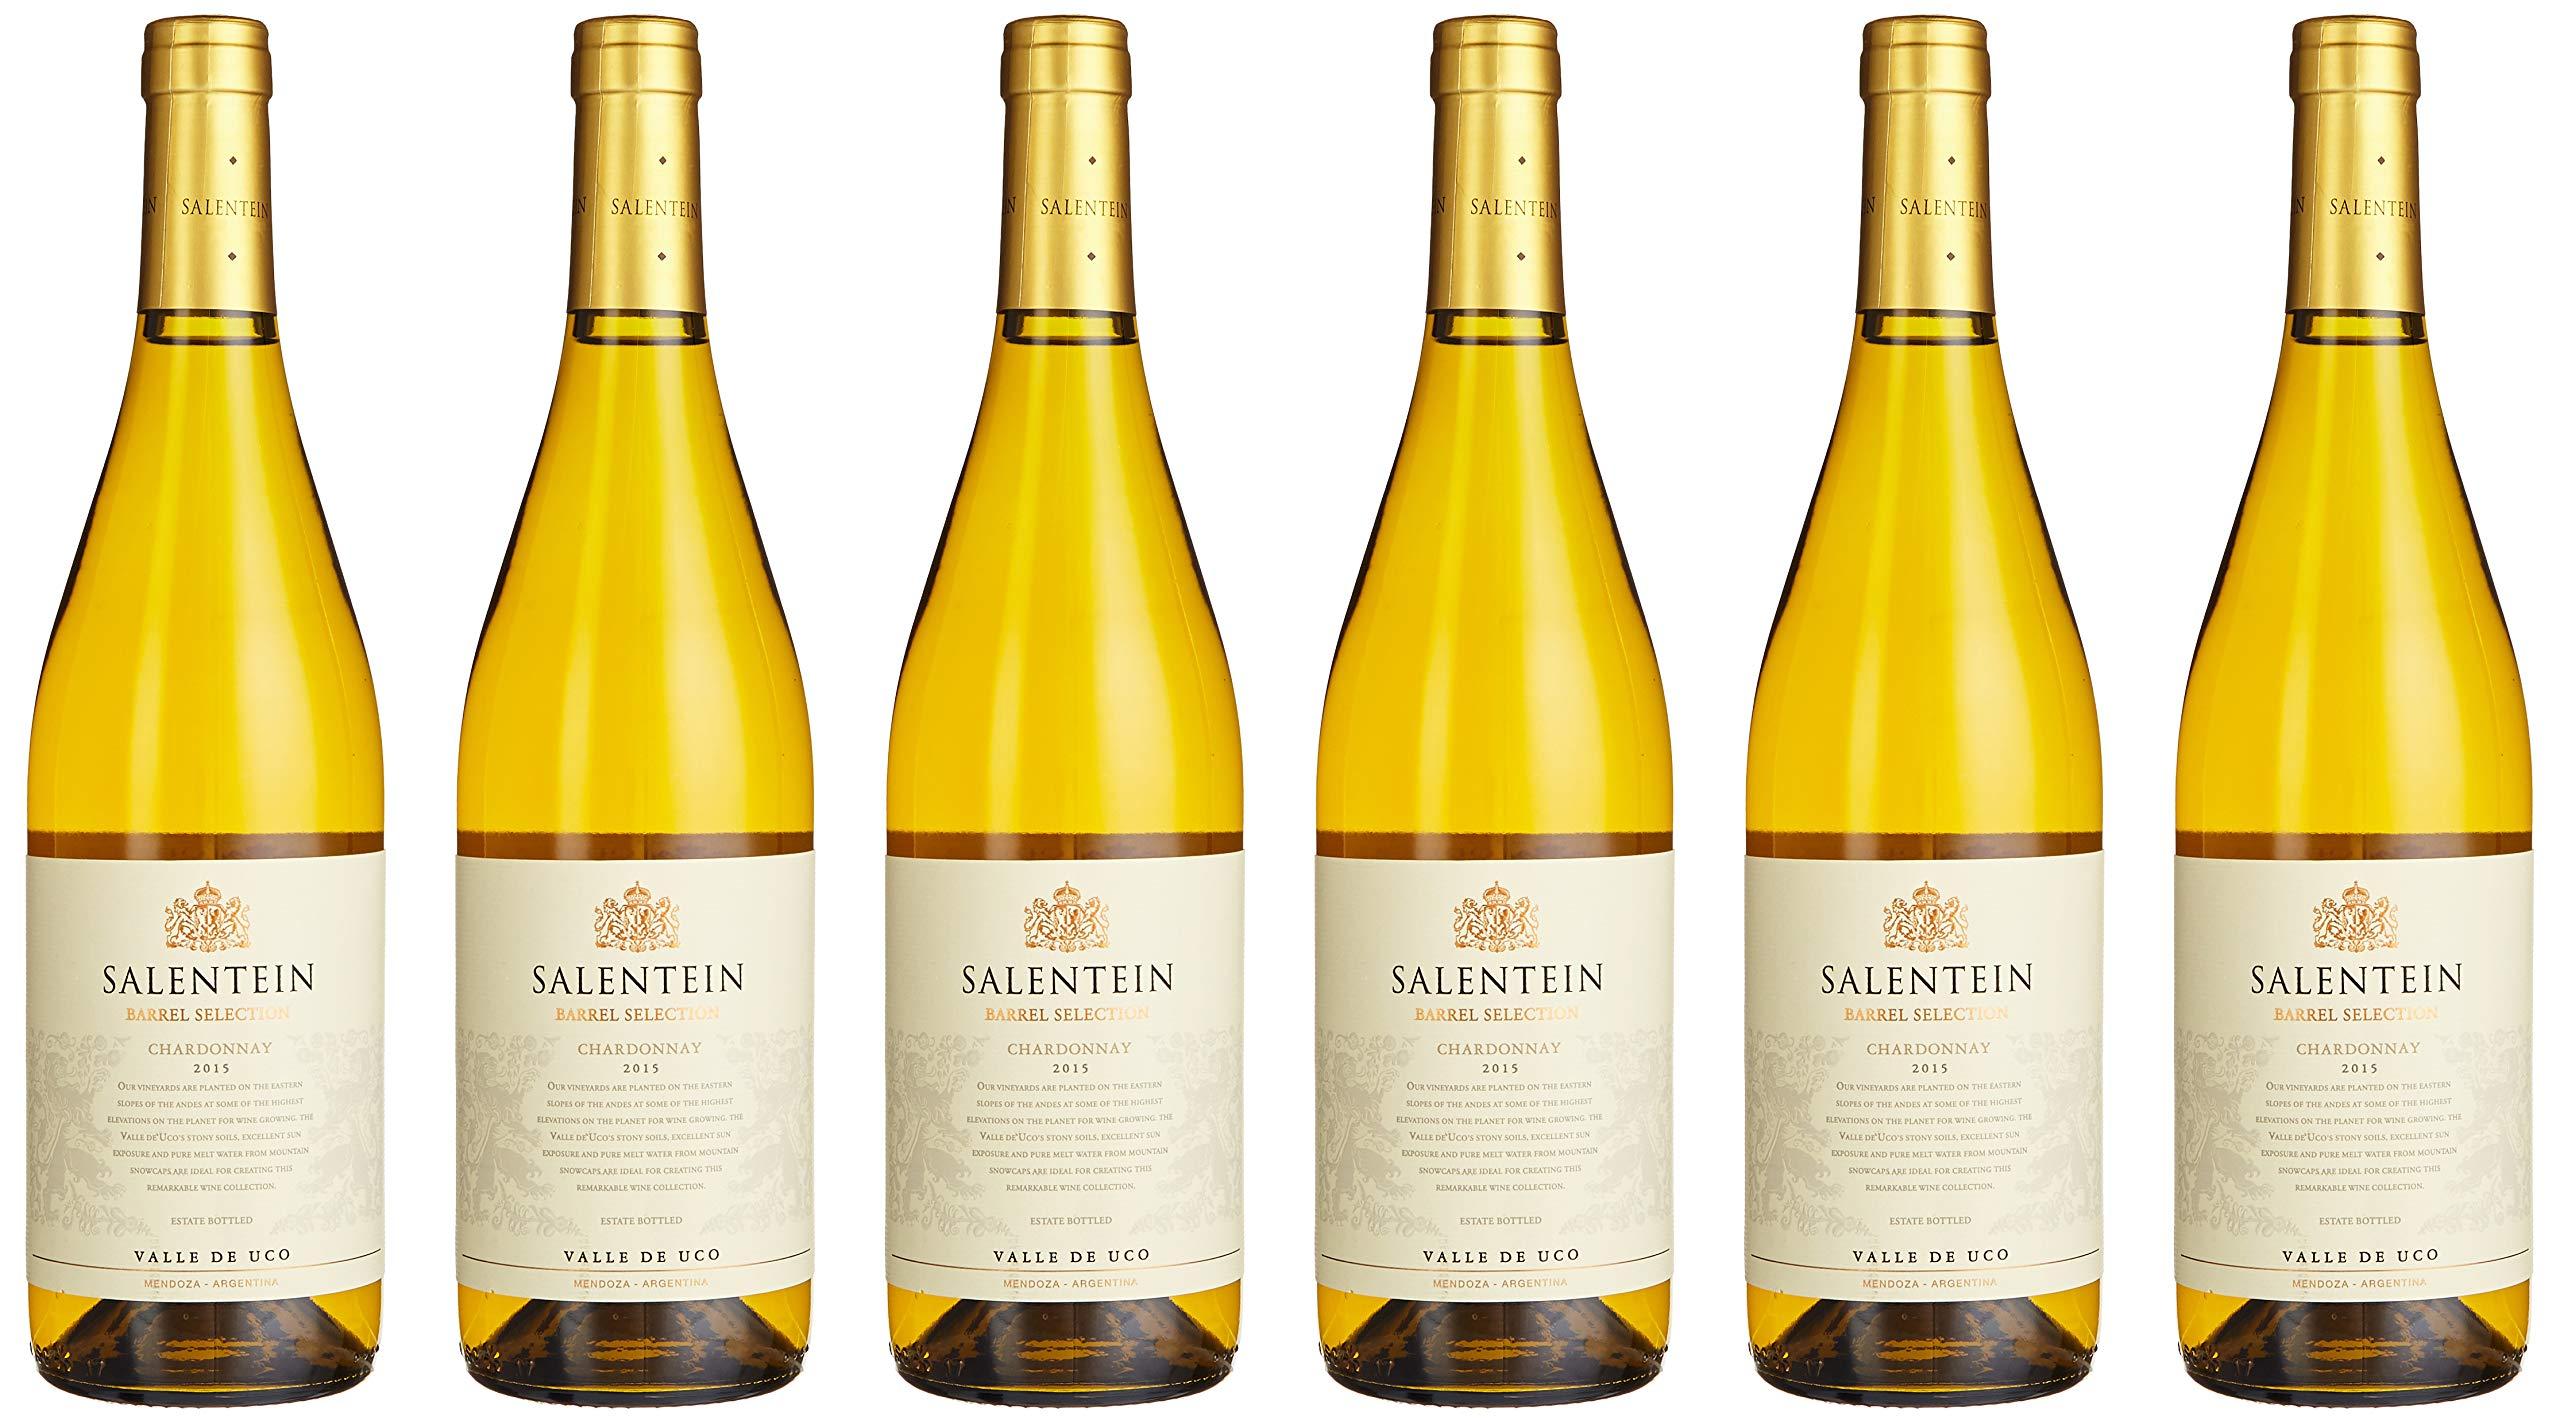 Bodegas-Salentein-Chardonnay-Barrel-Fermented-2015-Trocken-6-x-075-l